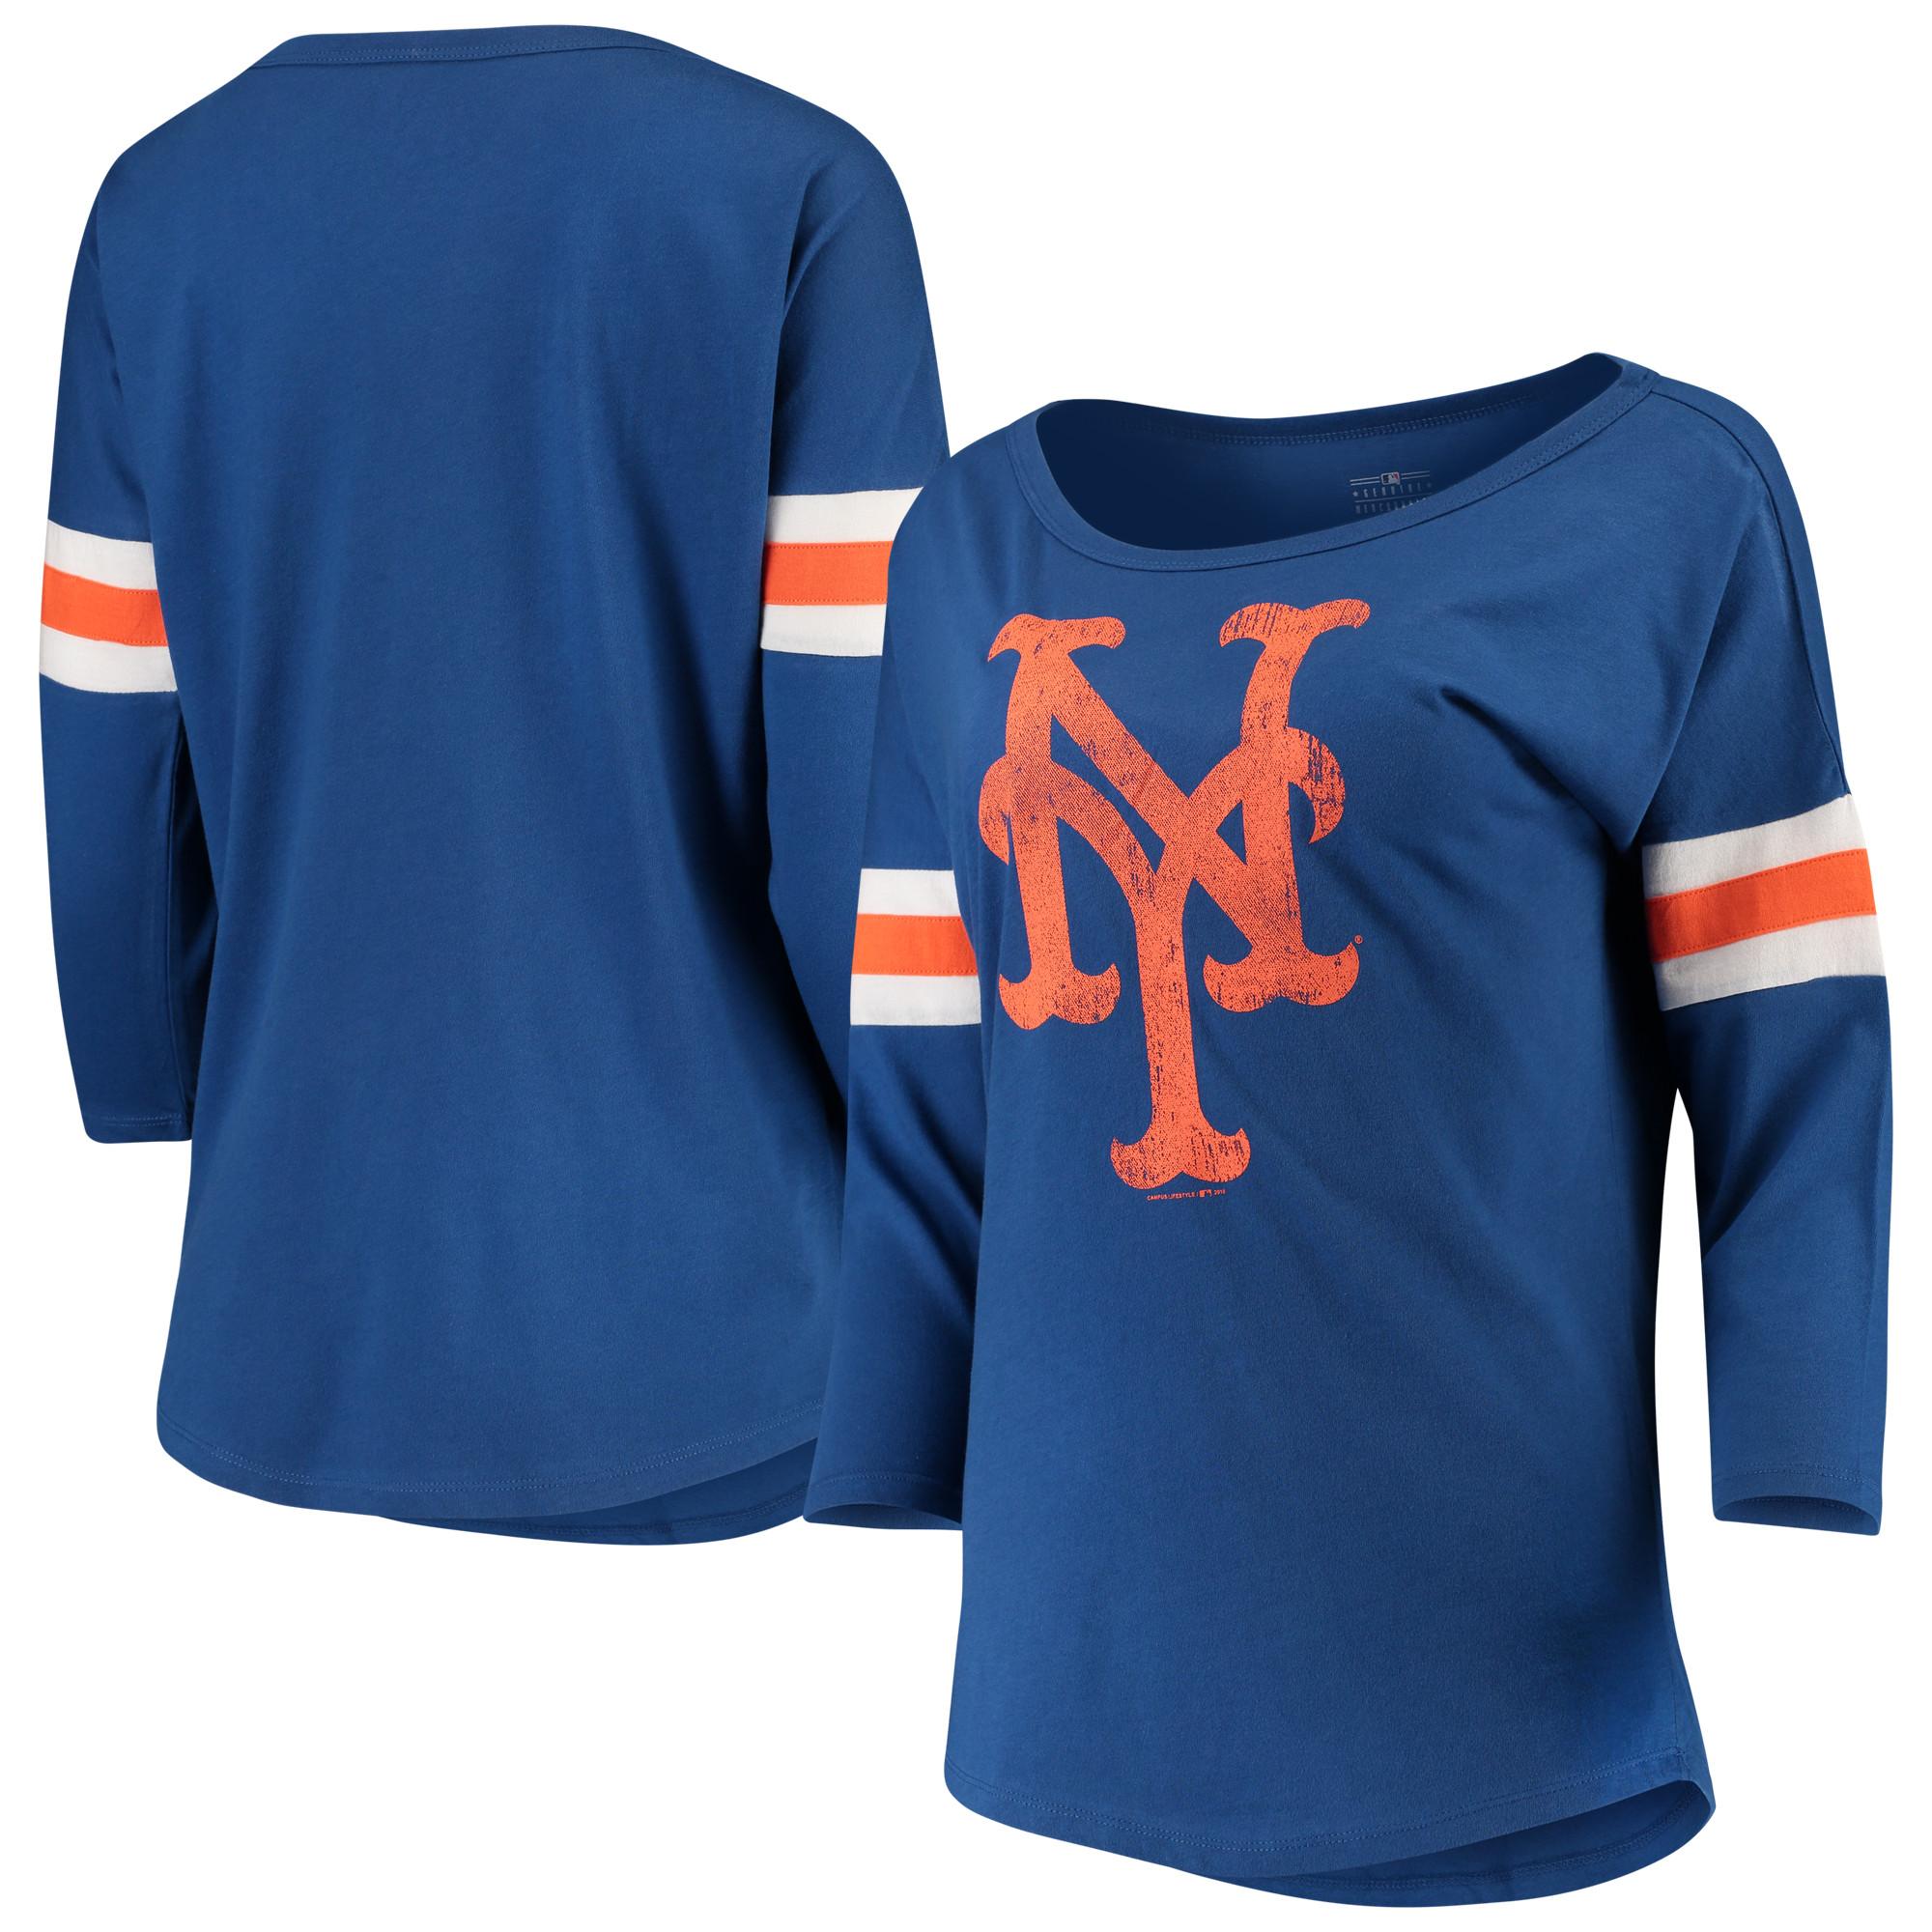 Women's New Era Royal New York Mets Scoop Neck 3/4-Sleeve T-Shirt